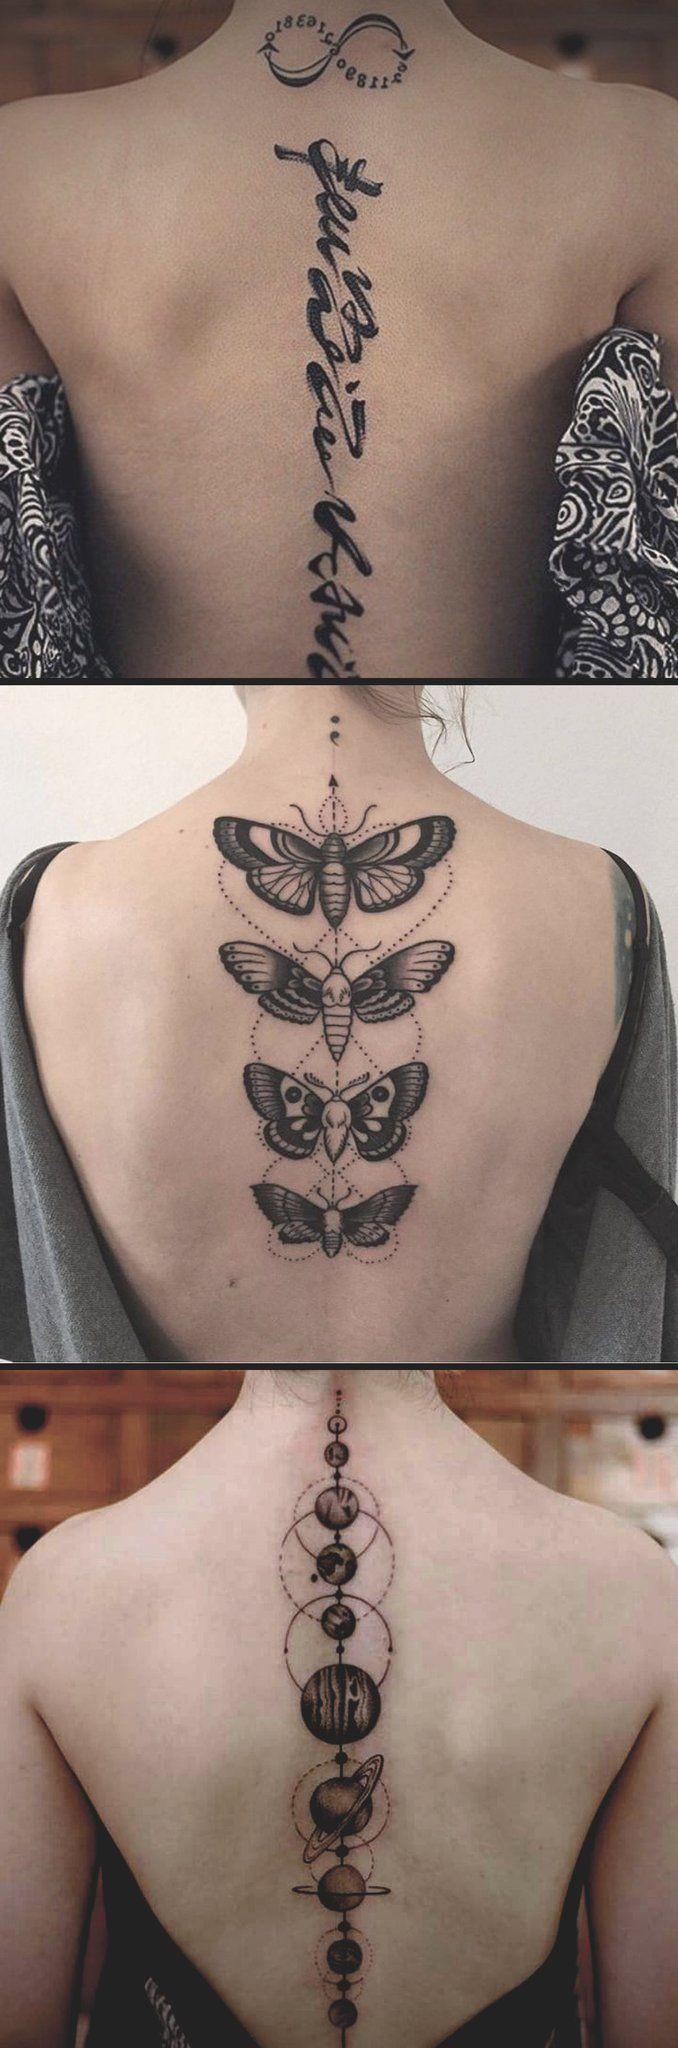 Pin on Female Tattoo Ideas